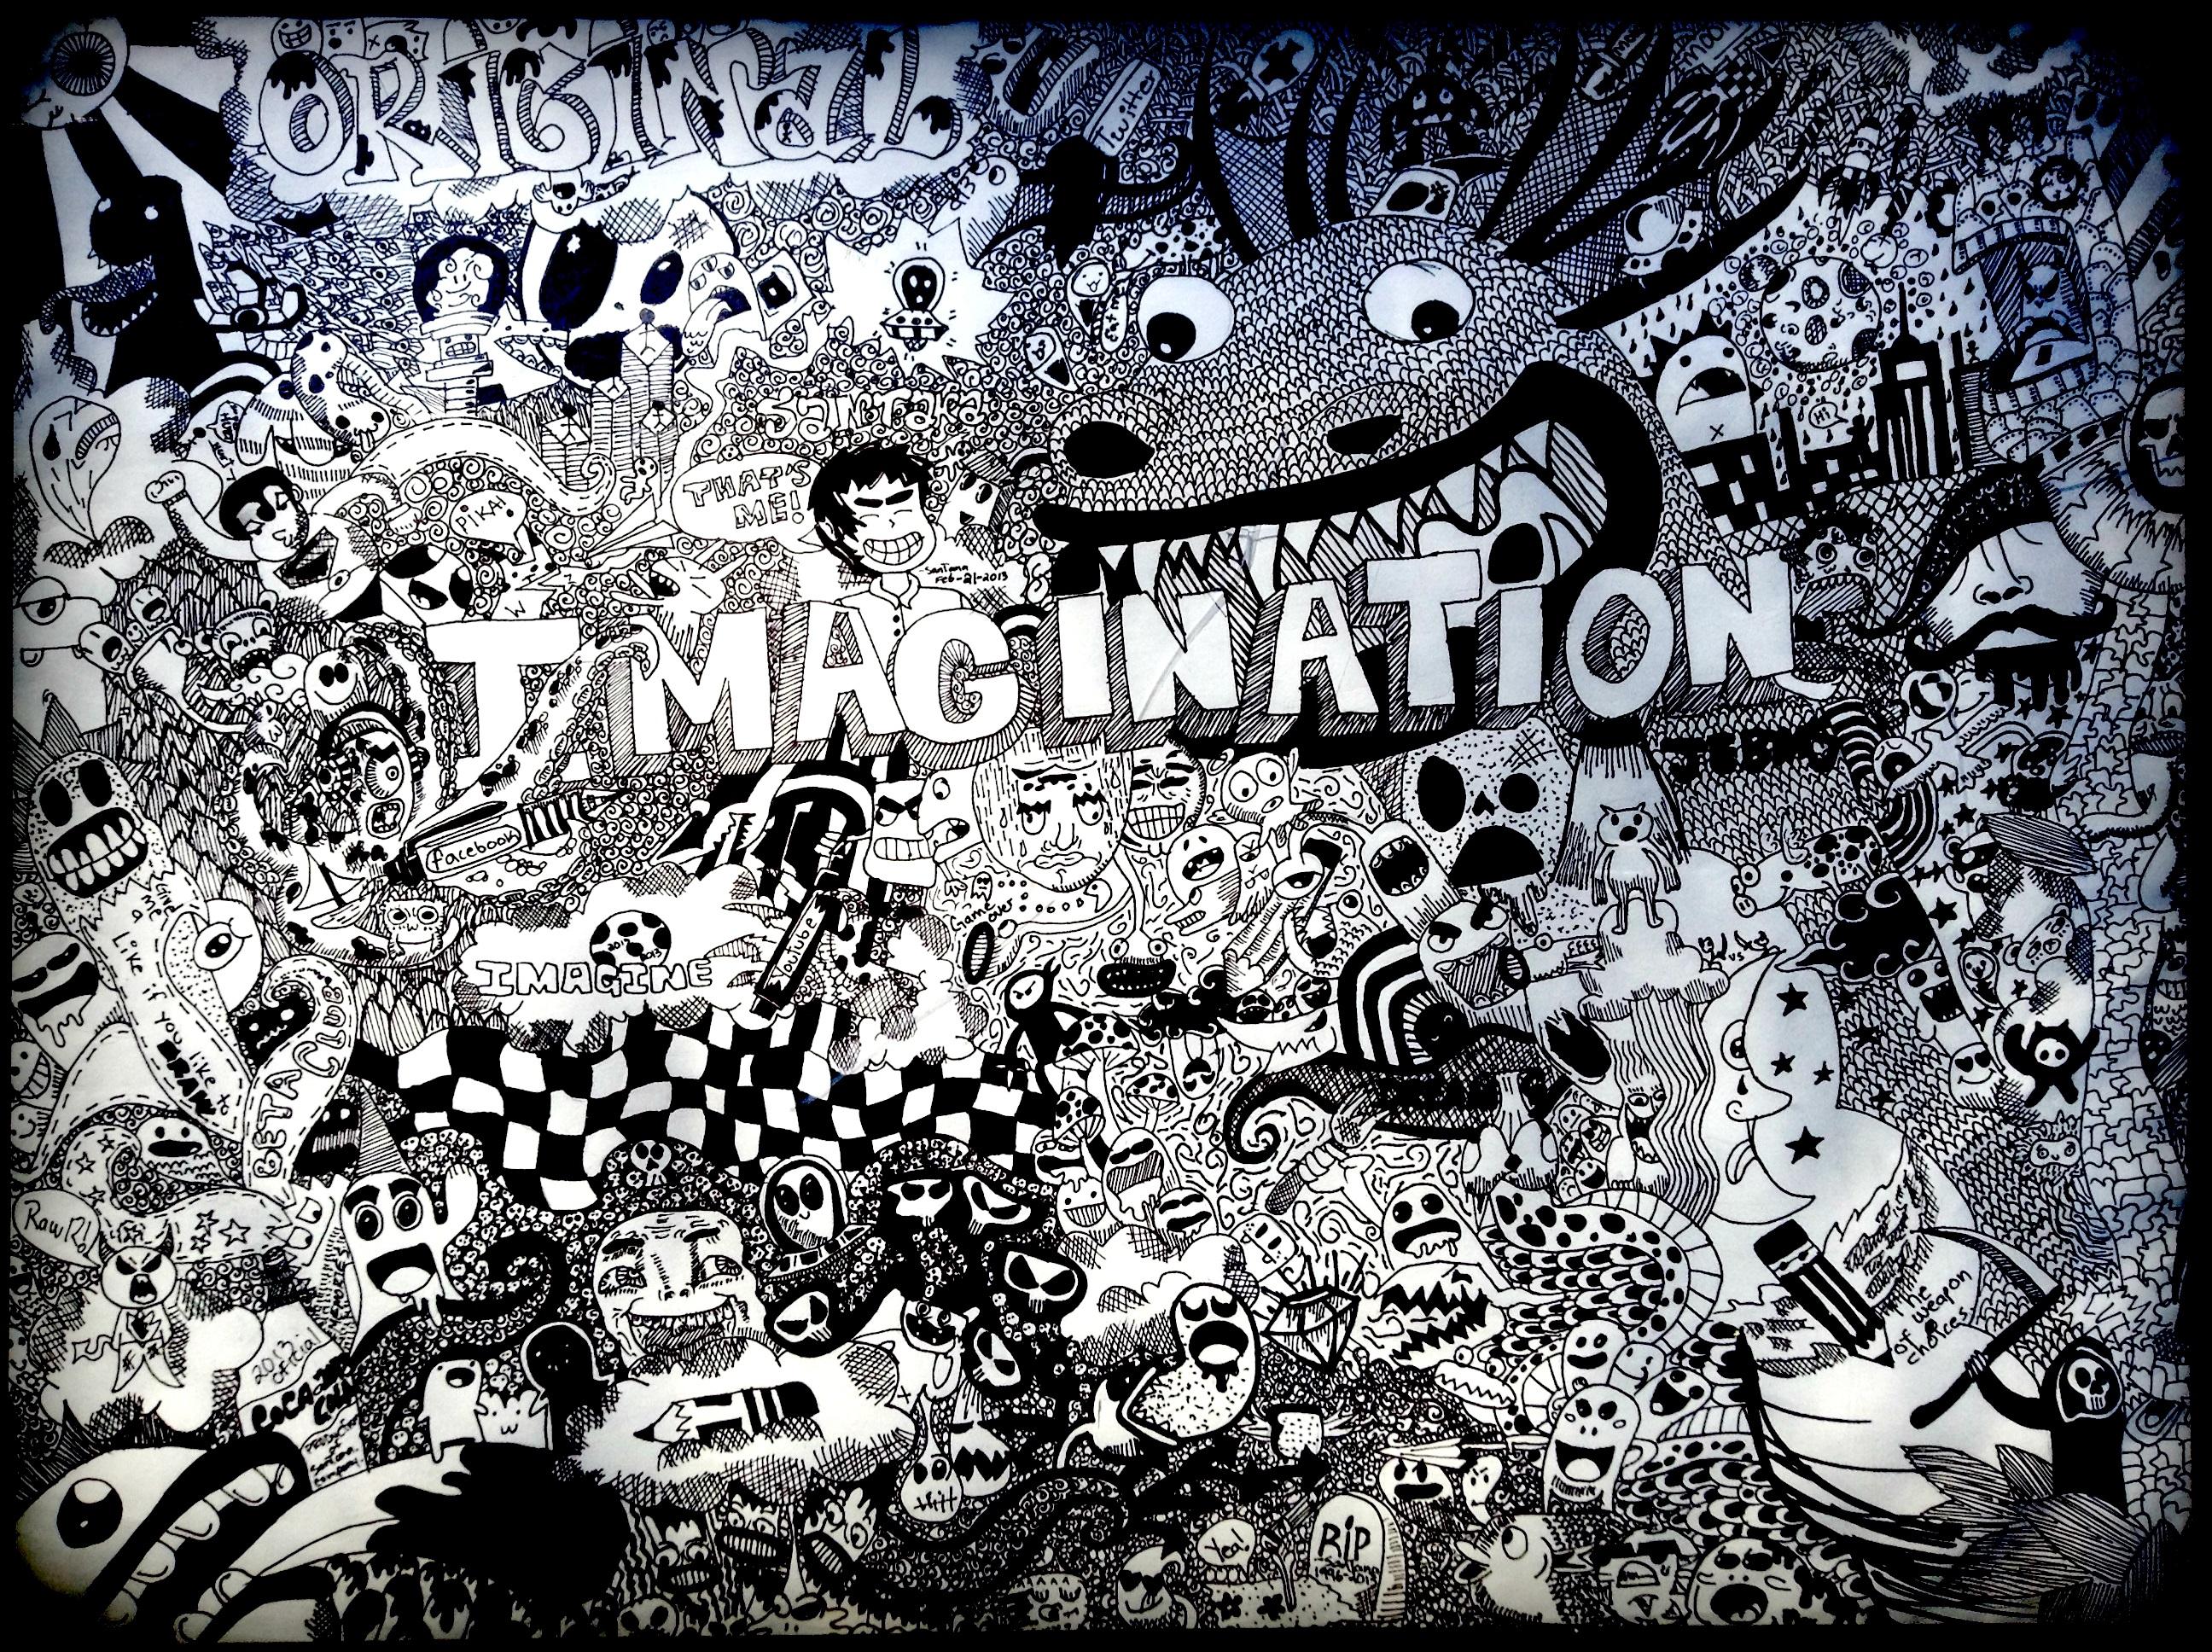 Imagination by Santanacruz